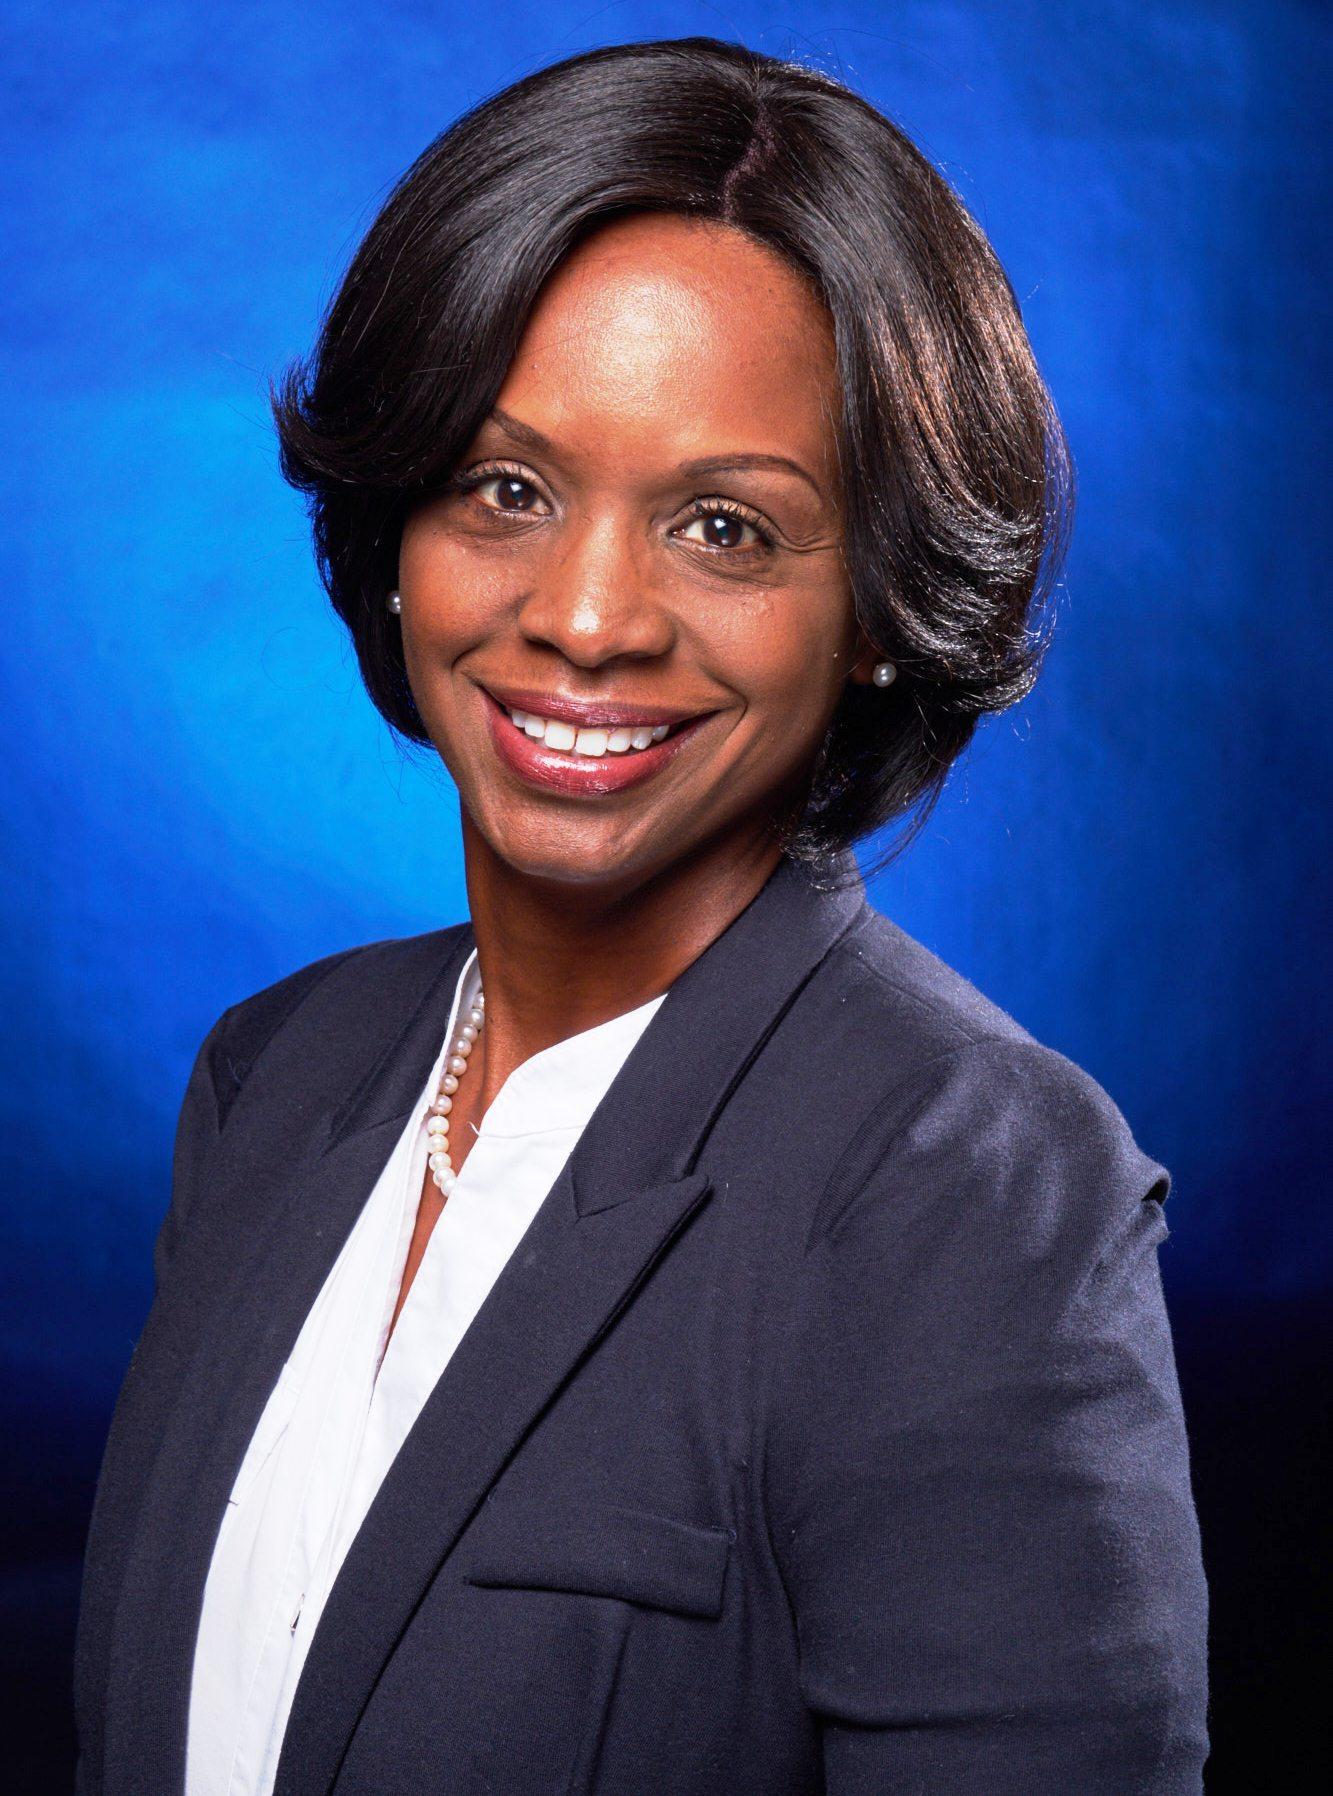 Indira Thompson